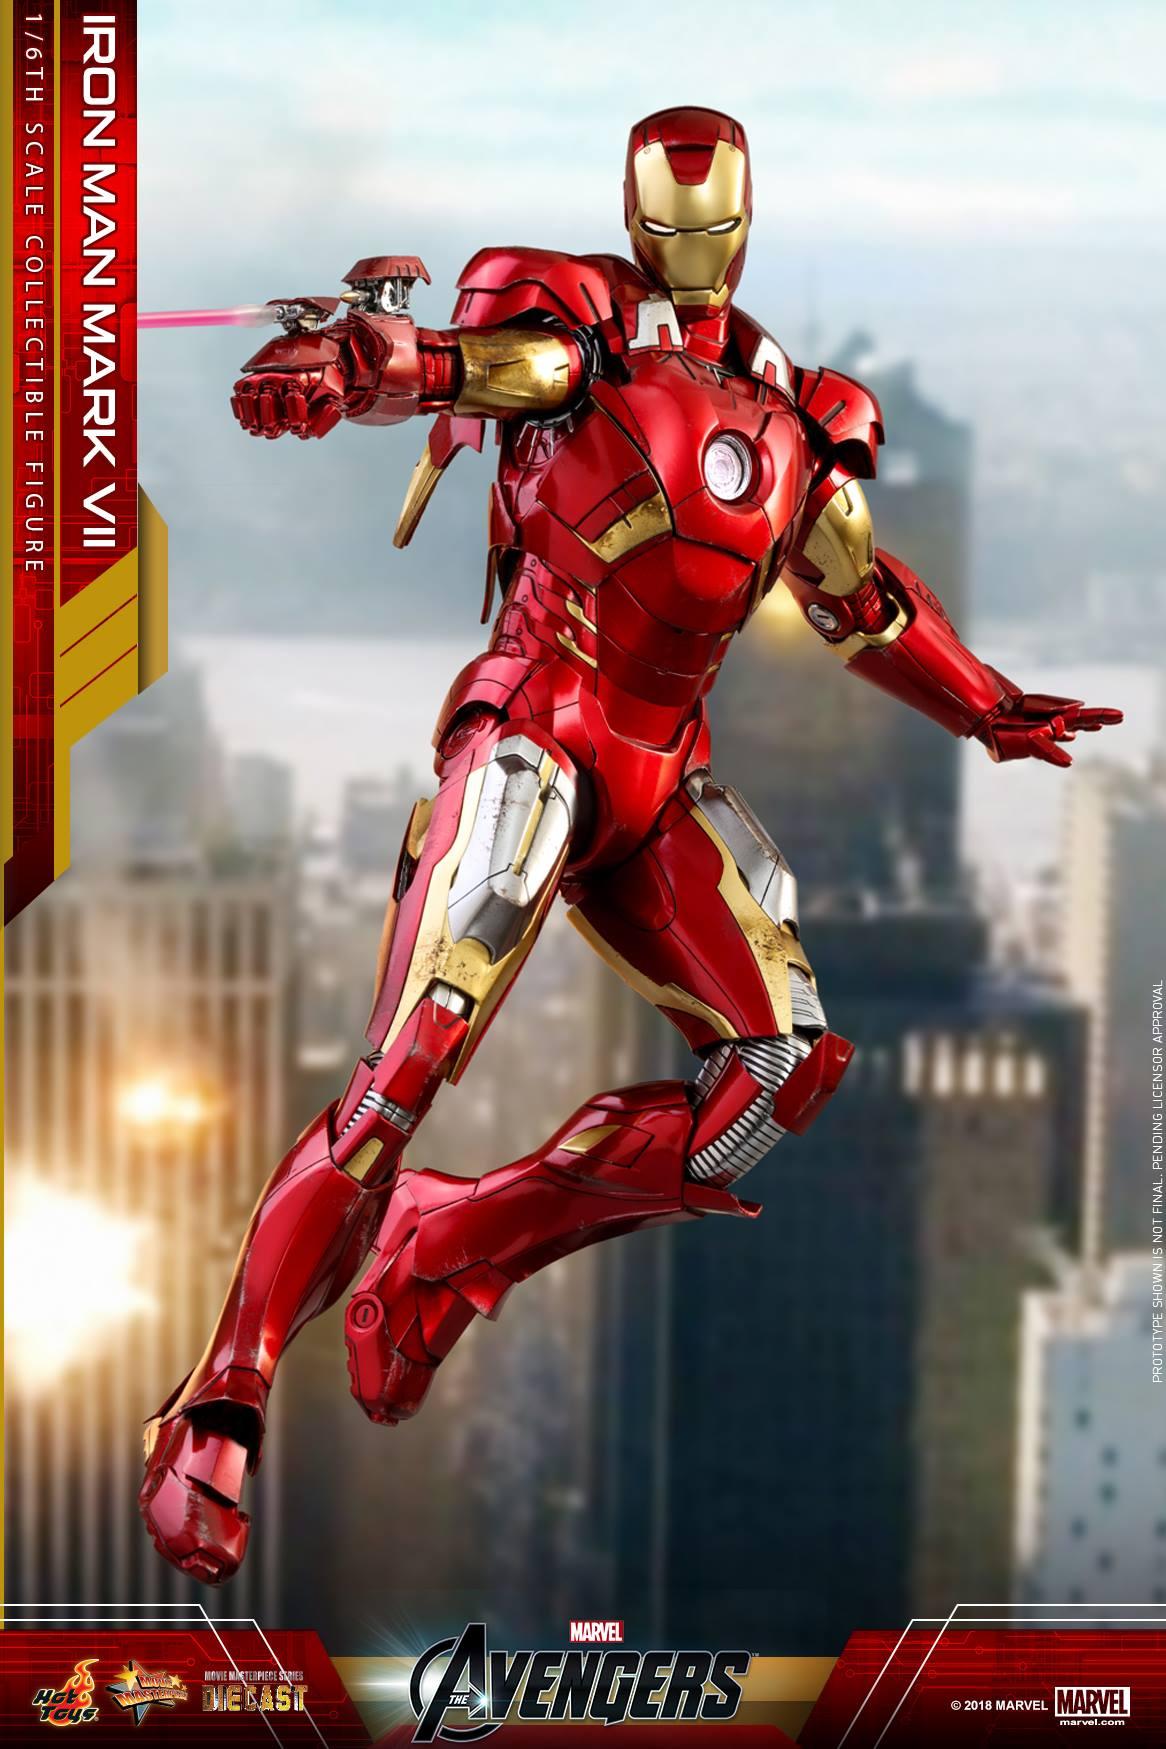 Hot Toys Iron Man Mark VII Die-Cast 1/6 Figure Photos ...